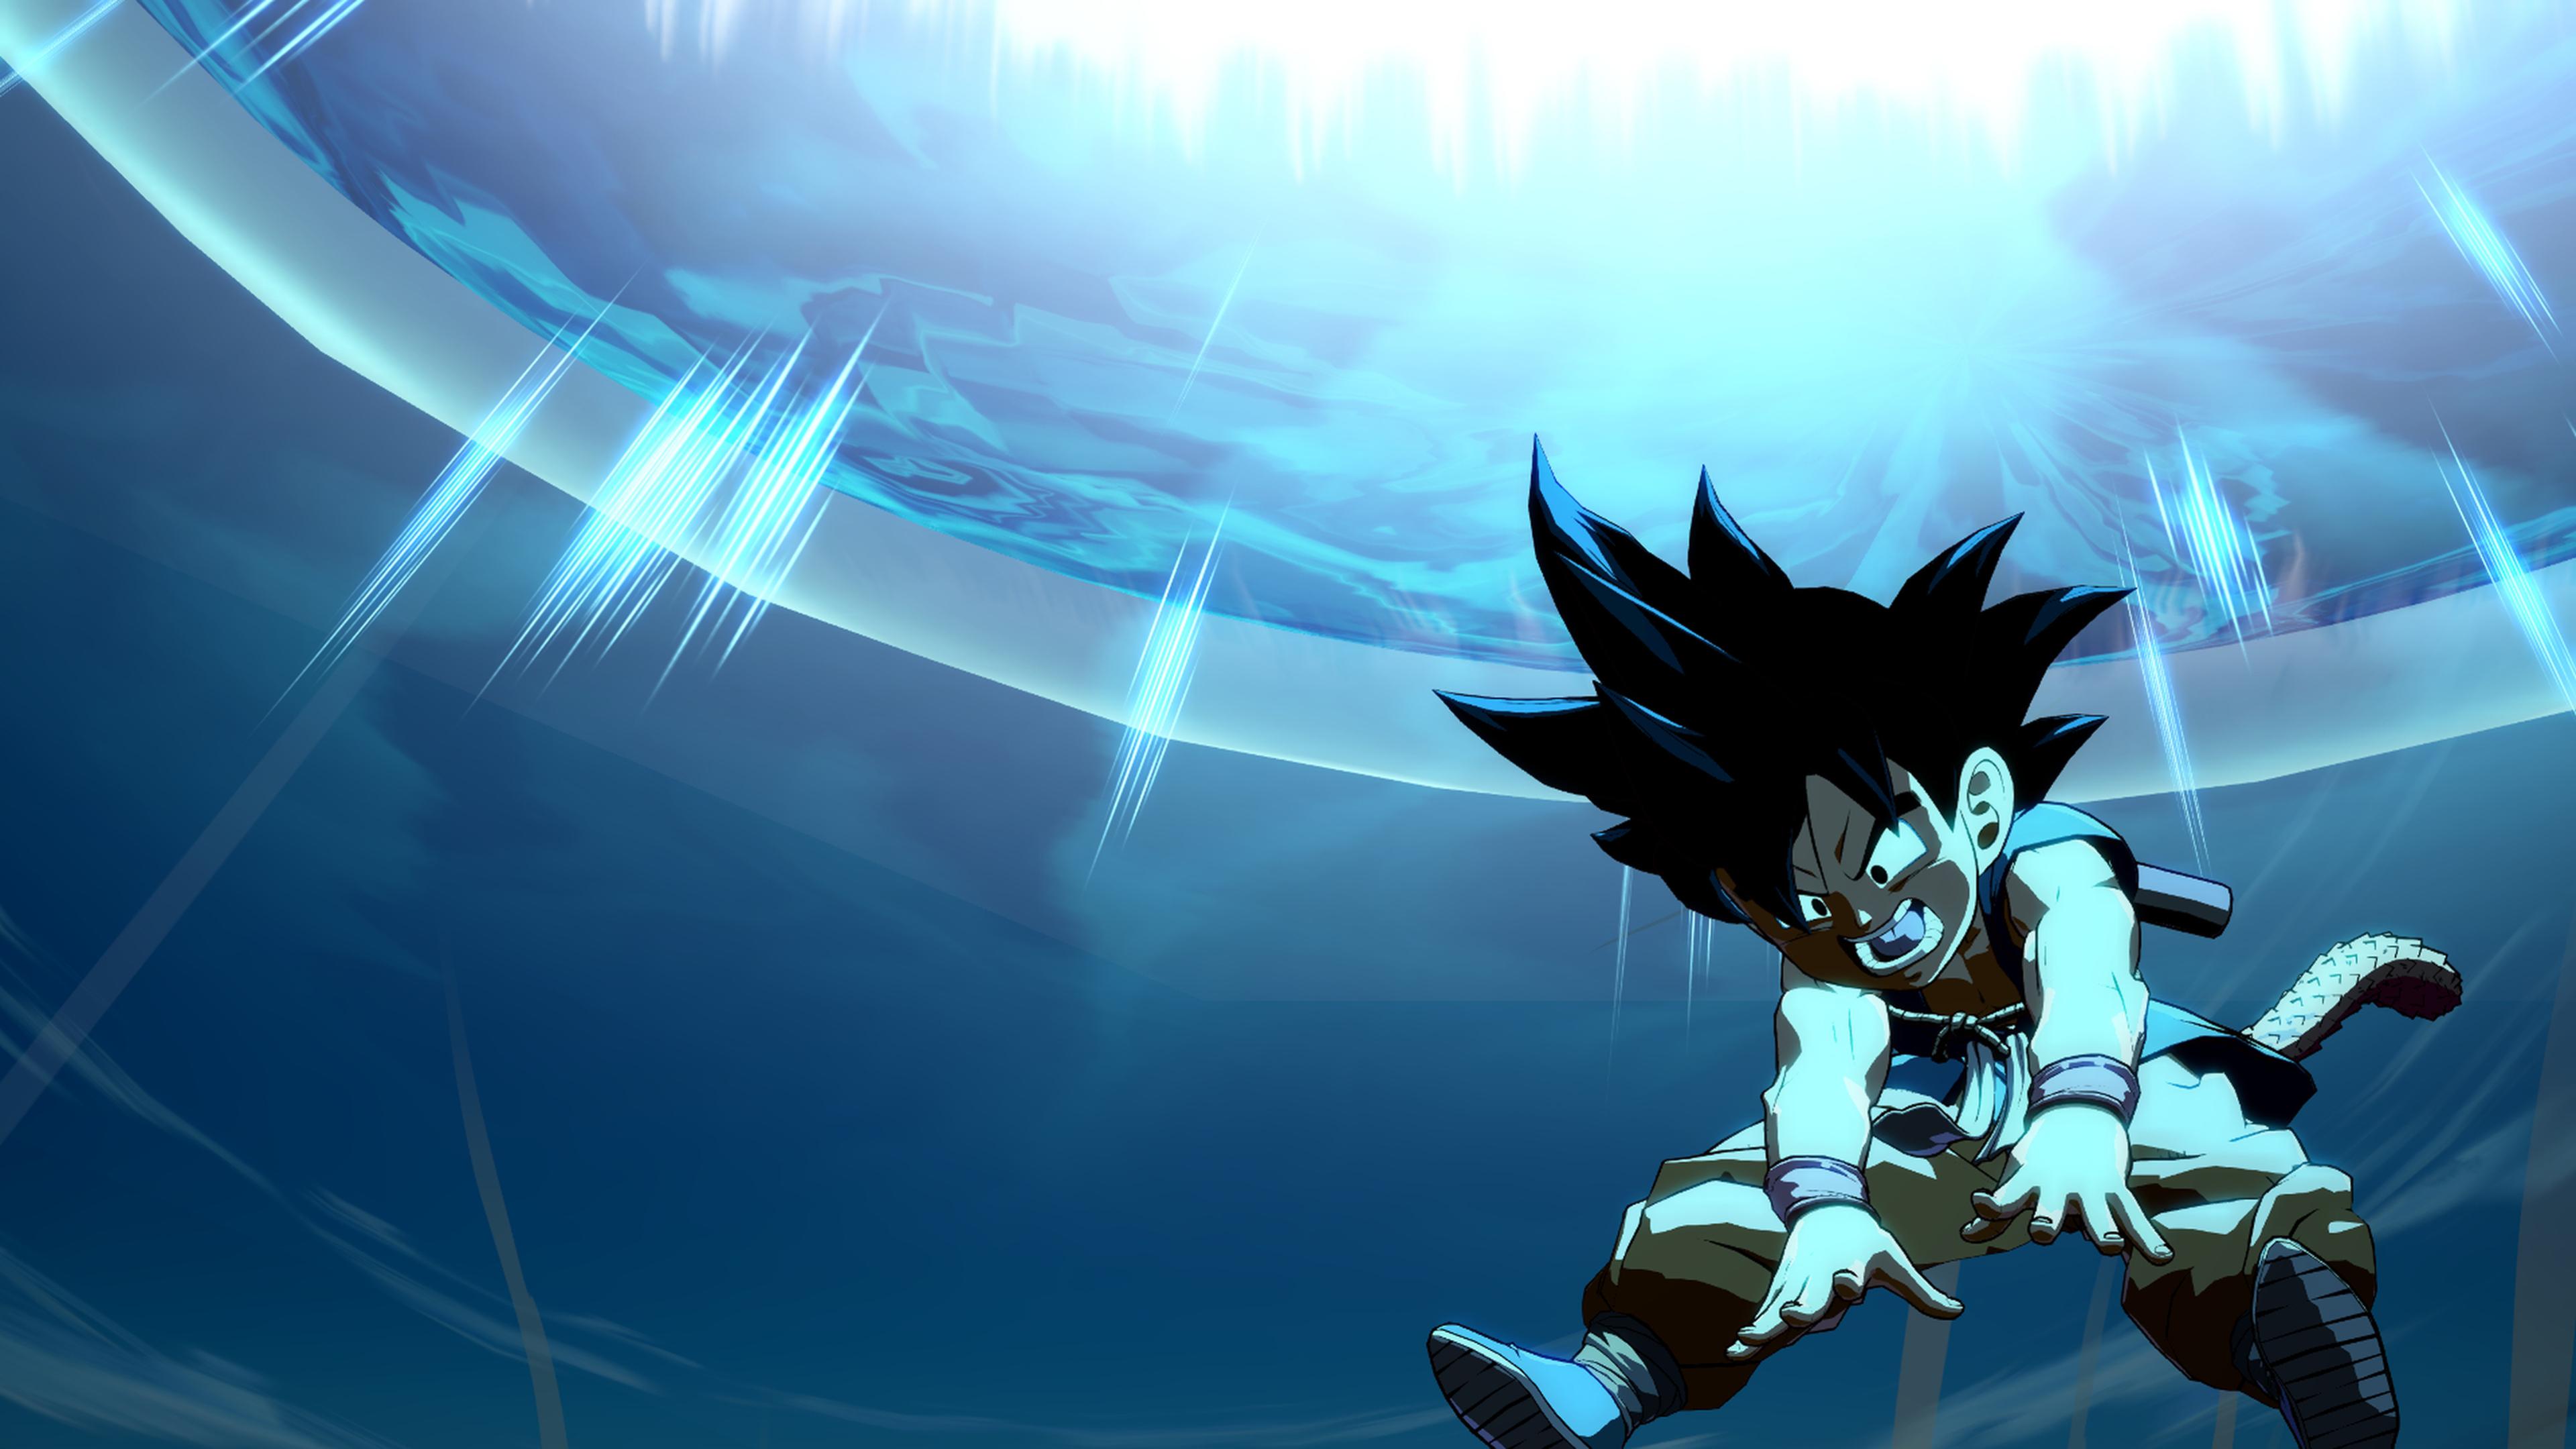 3840x2160 Kid Goku 4K Wallpaper, HD Anime 4K Wallpapers ...